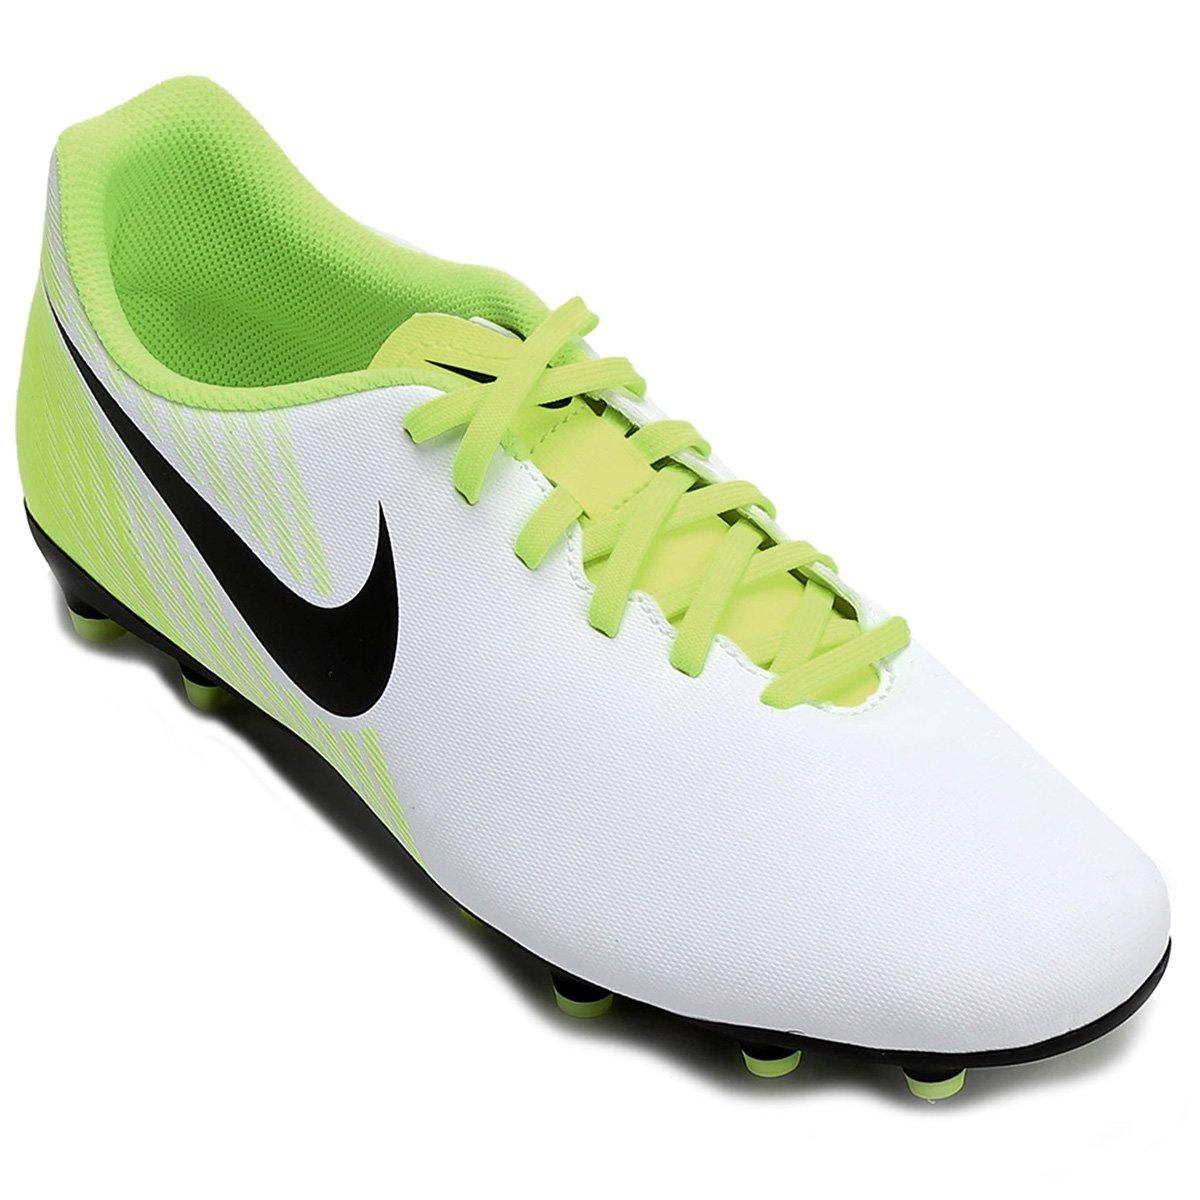 Chuteira Campo Nike Magista Ola II FG - Compre Agora  1f9345627059a